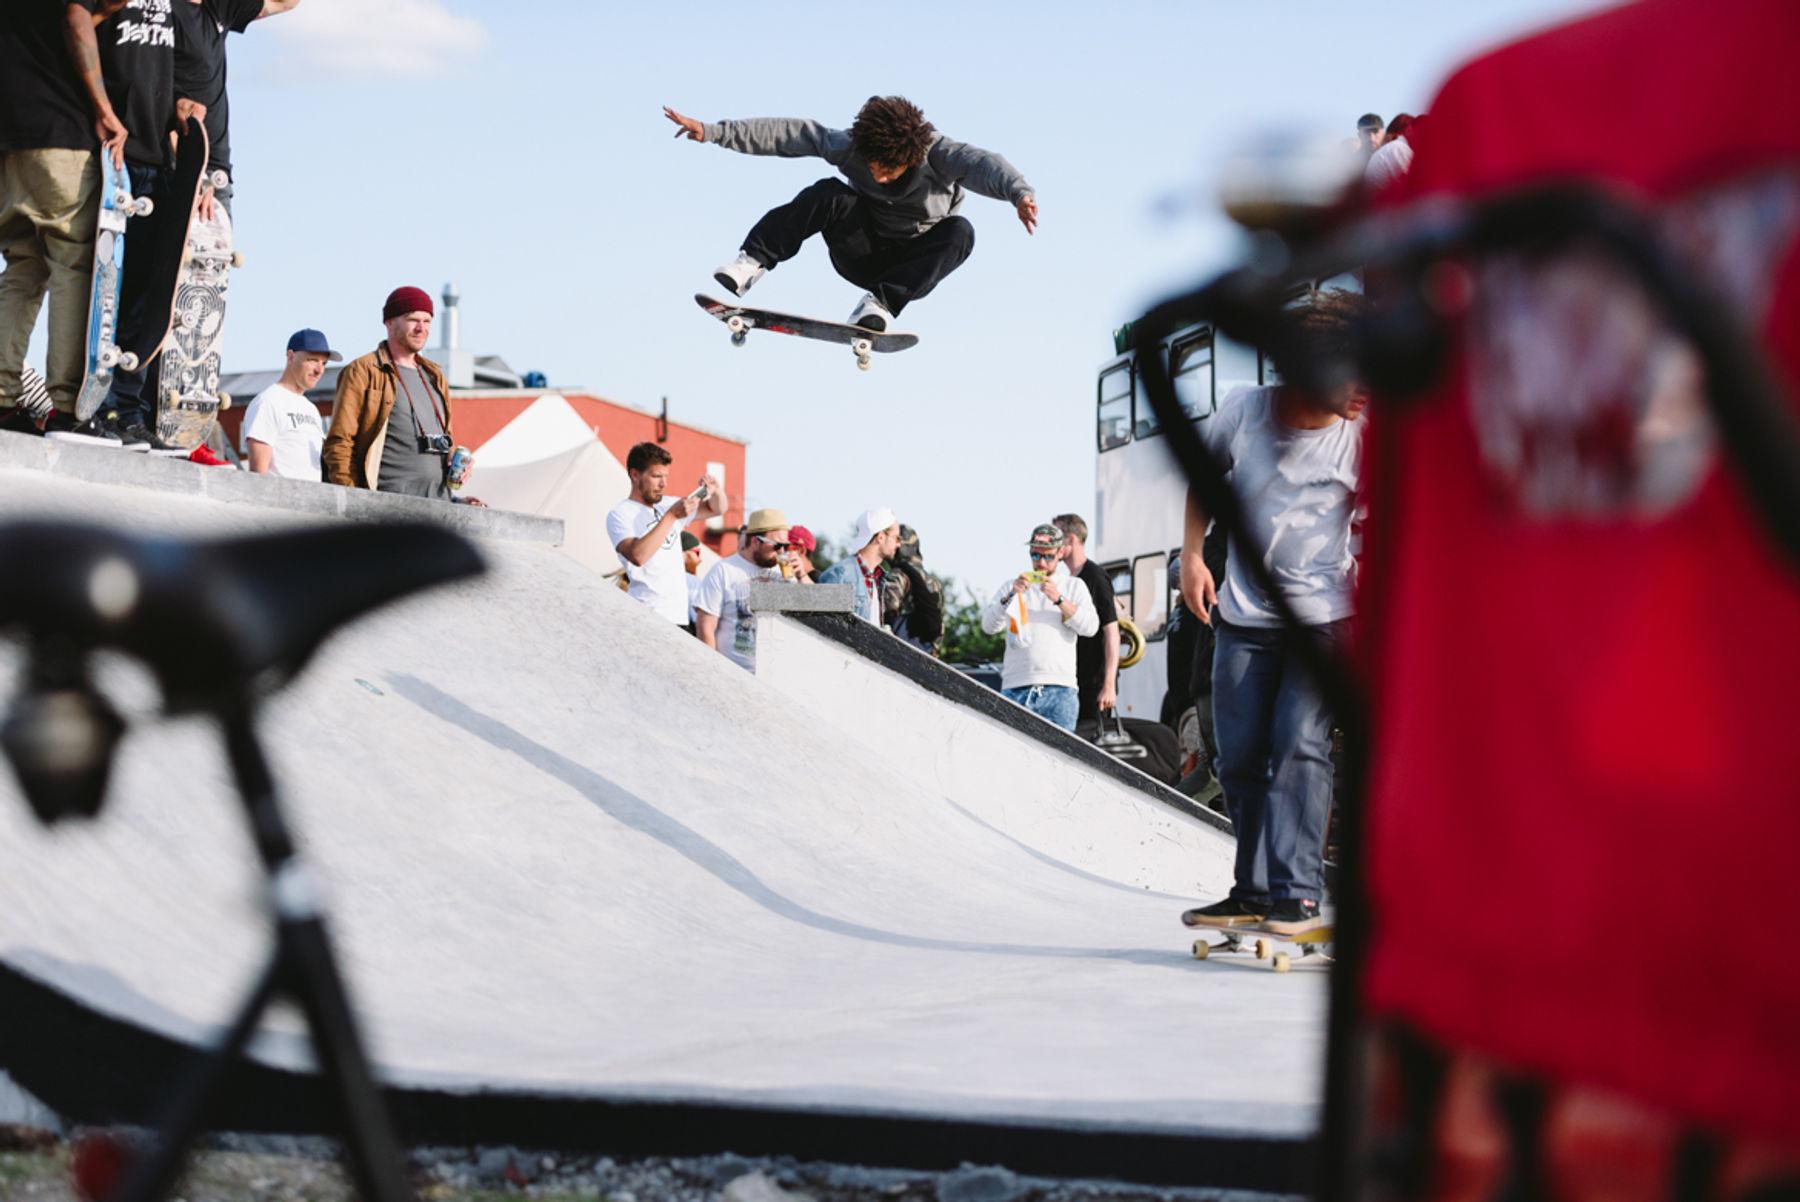 _IHC5881e-Kevin-Bradley-Fs-Flip-Nike-SB-Copenhagen-Open-Day-4-July-2015-Photographer-Maksim-Kalanep